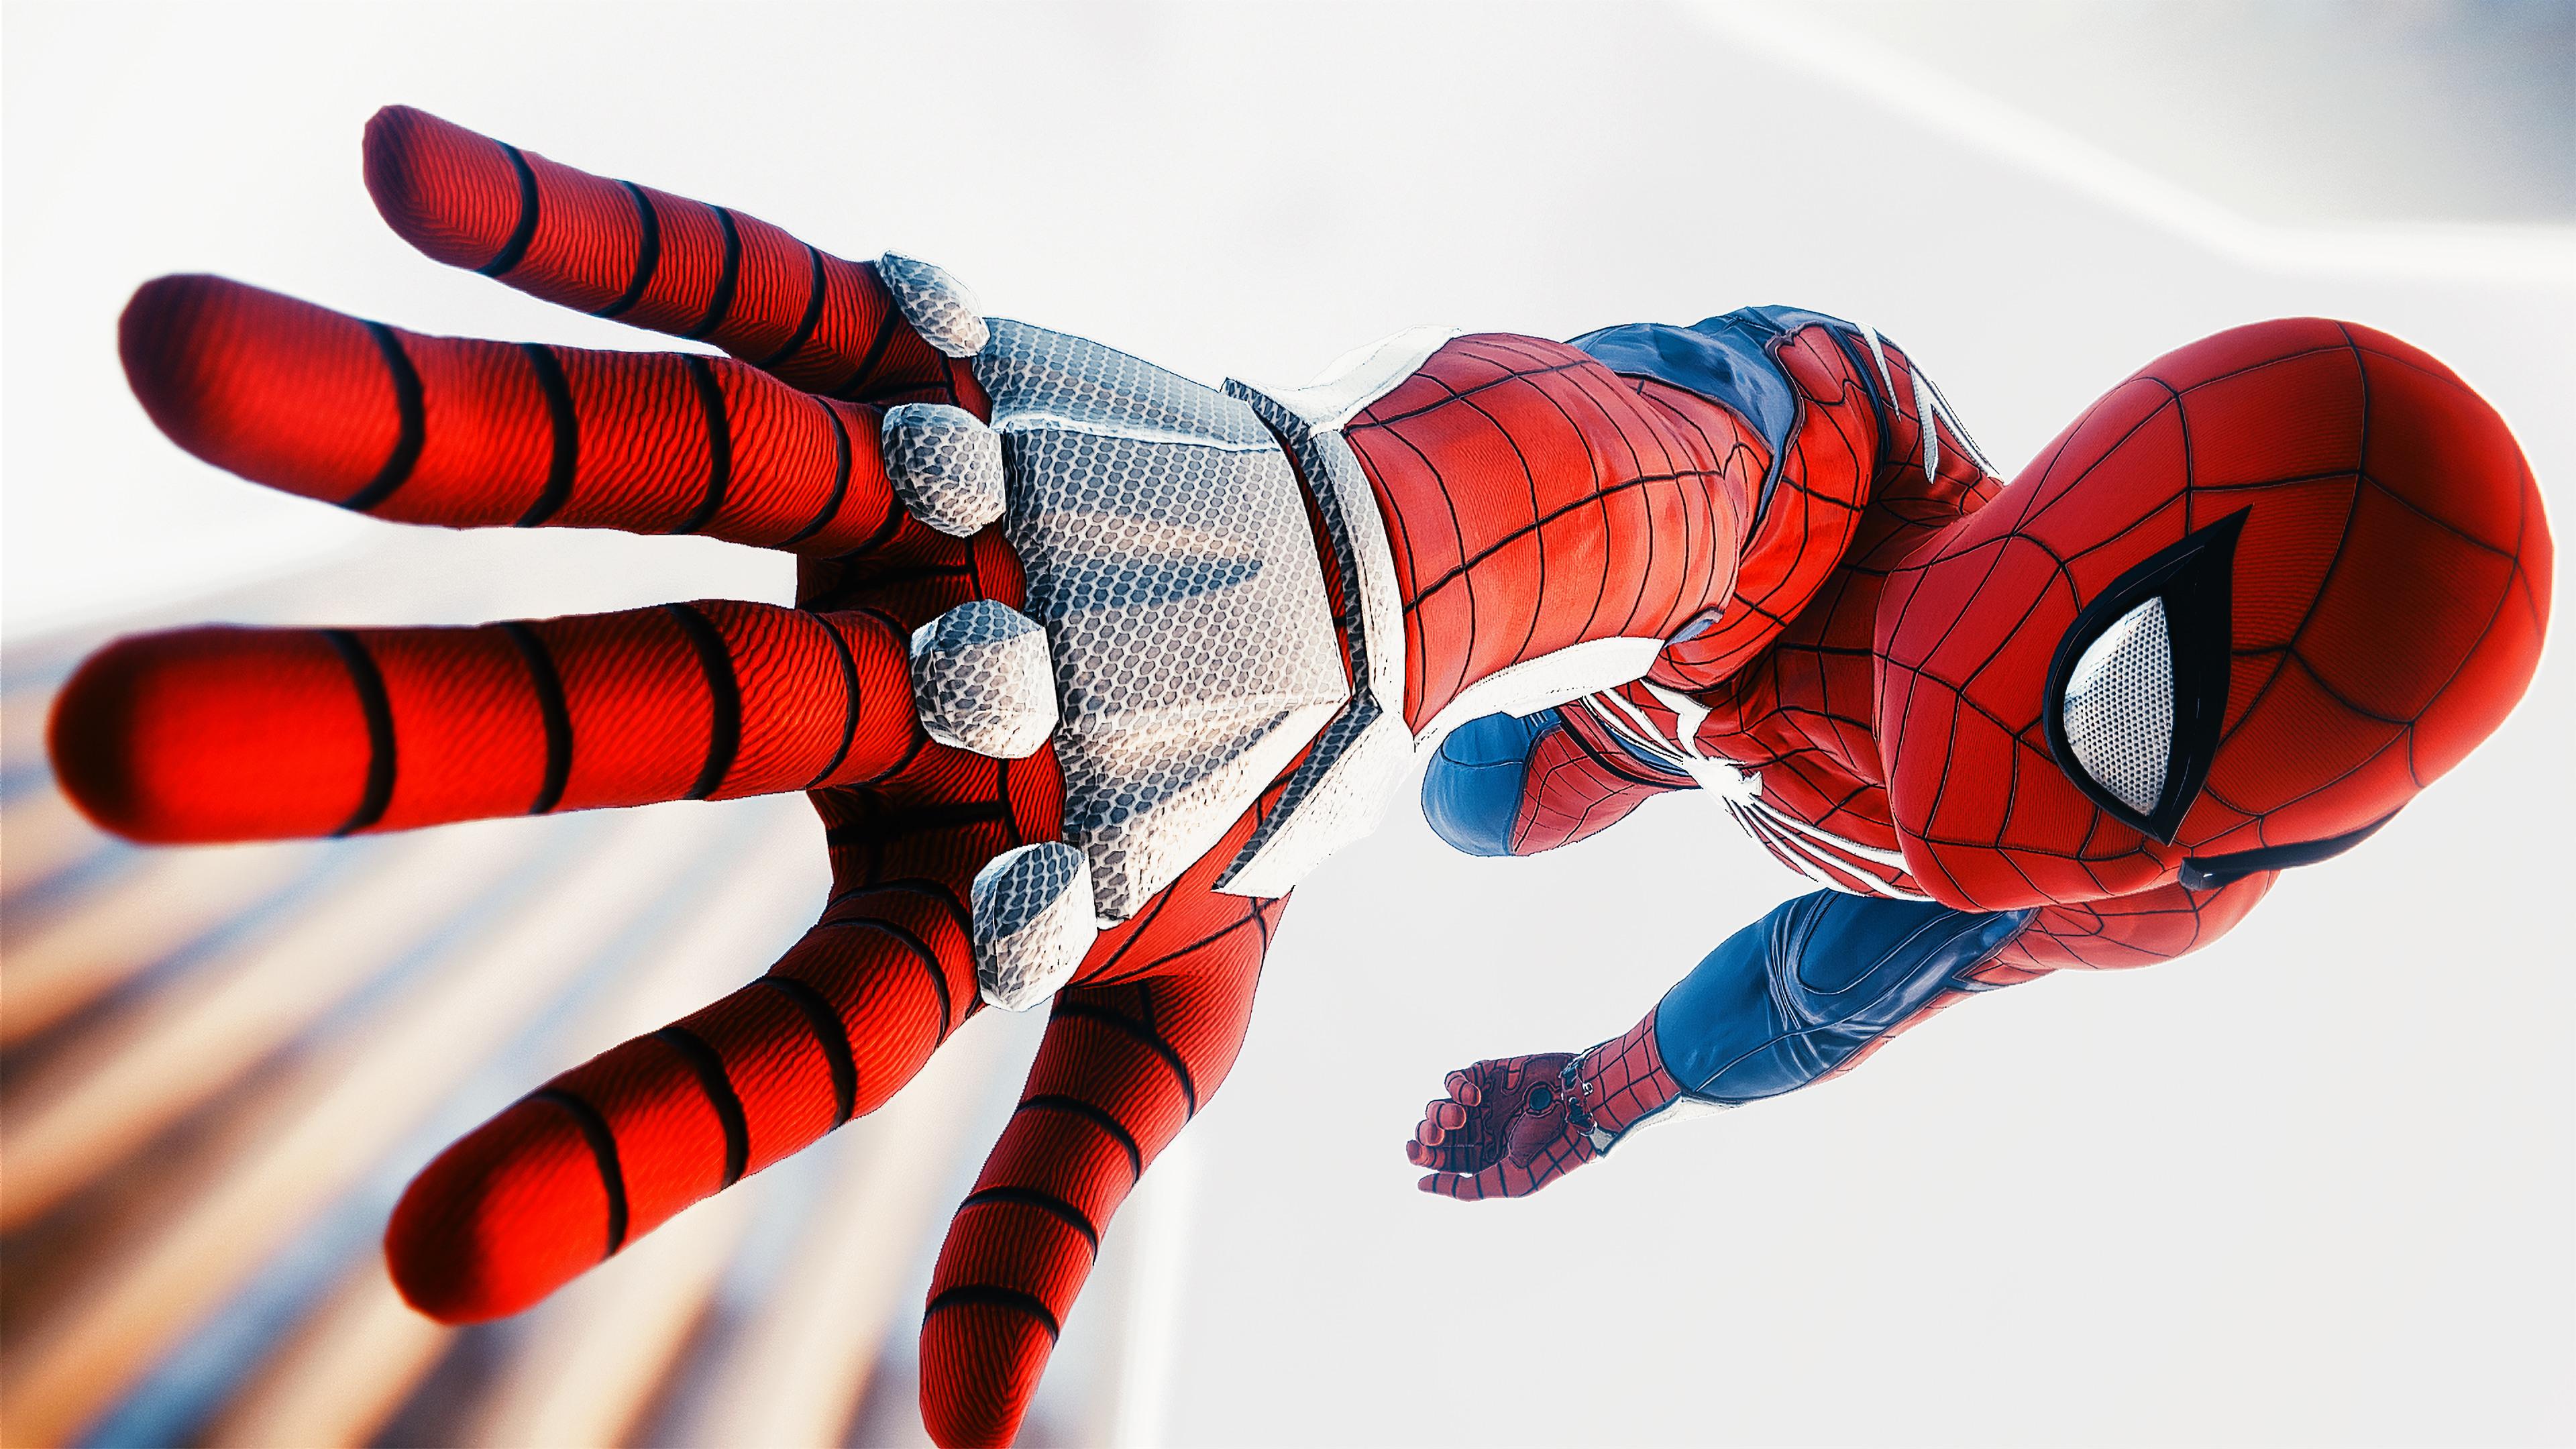 Spiderman Ps4 Advanced Suit 4k, HD Superheroes, 4k